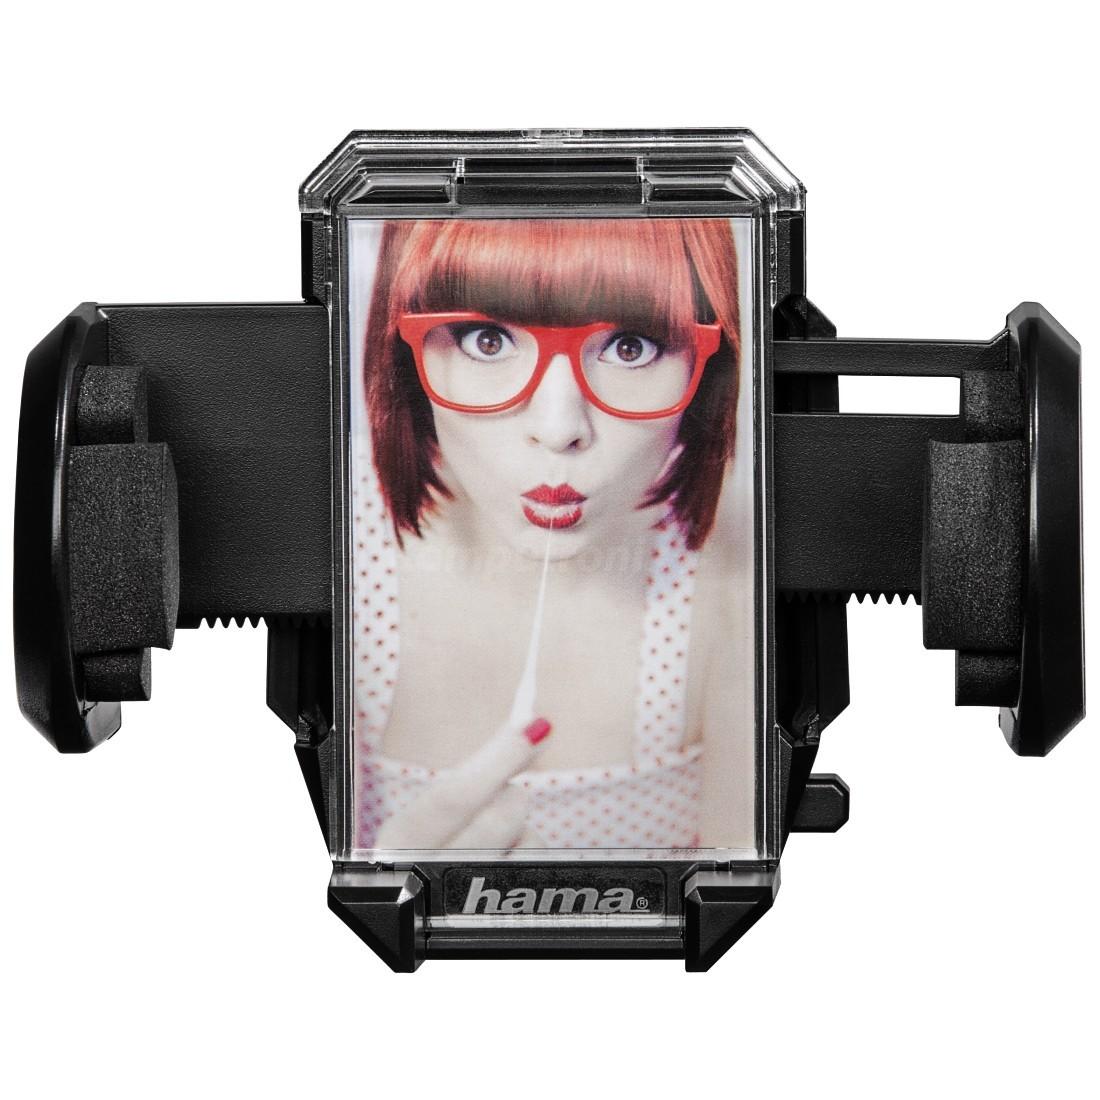 Hama Car-Mobile